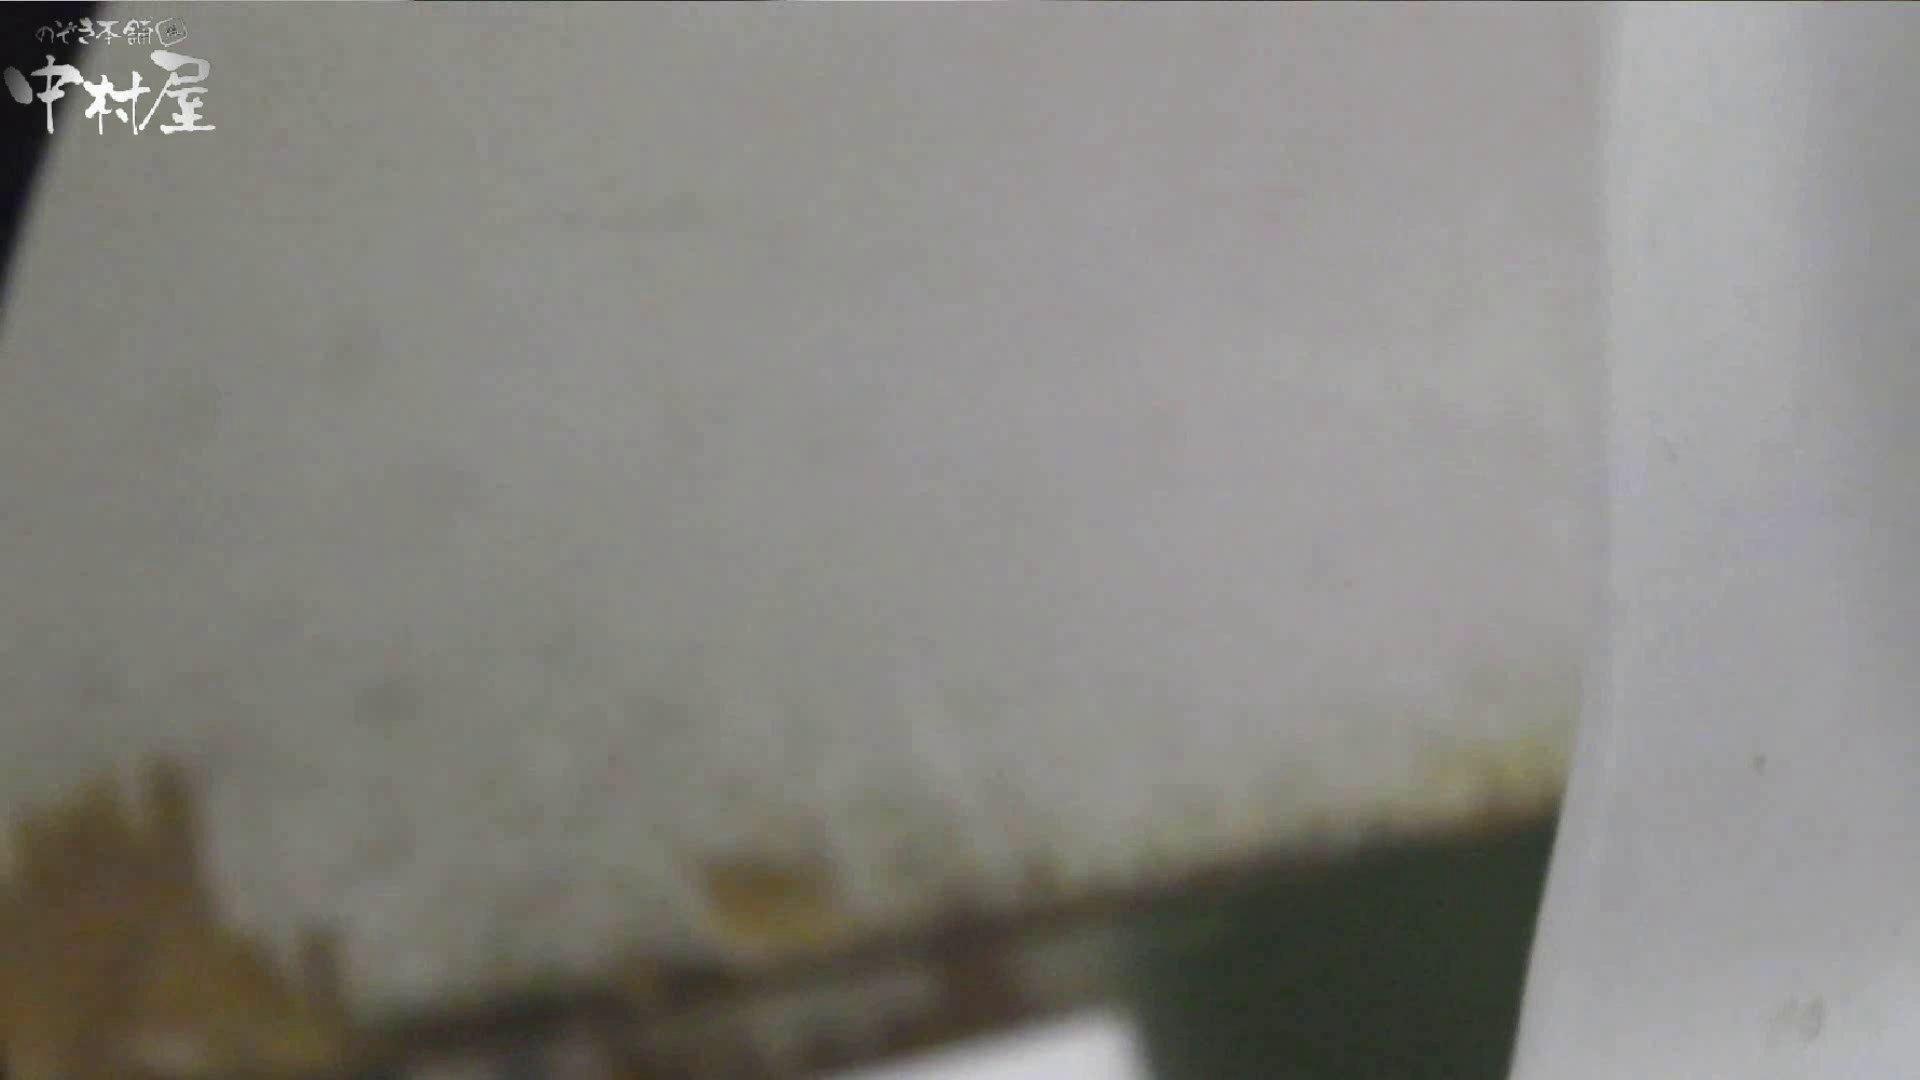 vol.49 命がけ潜伏洗面所! ポニテたんのソフトなブツ・推定180g 潜入シリーズ  74Pix 74